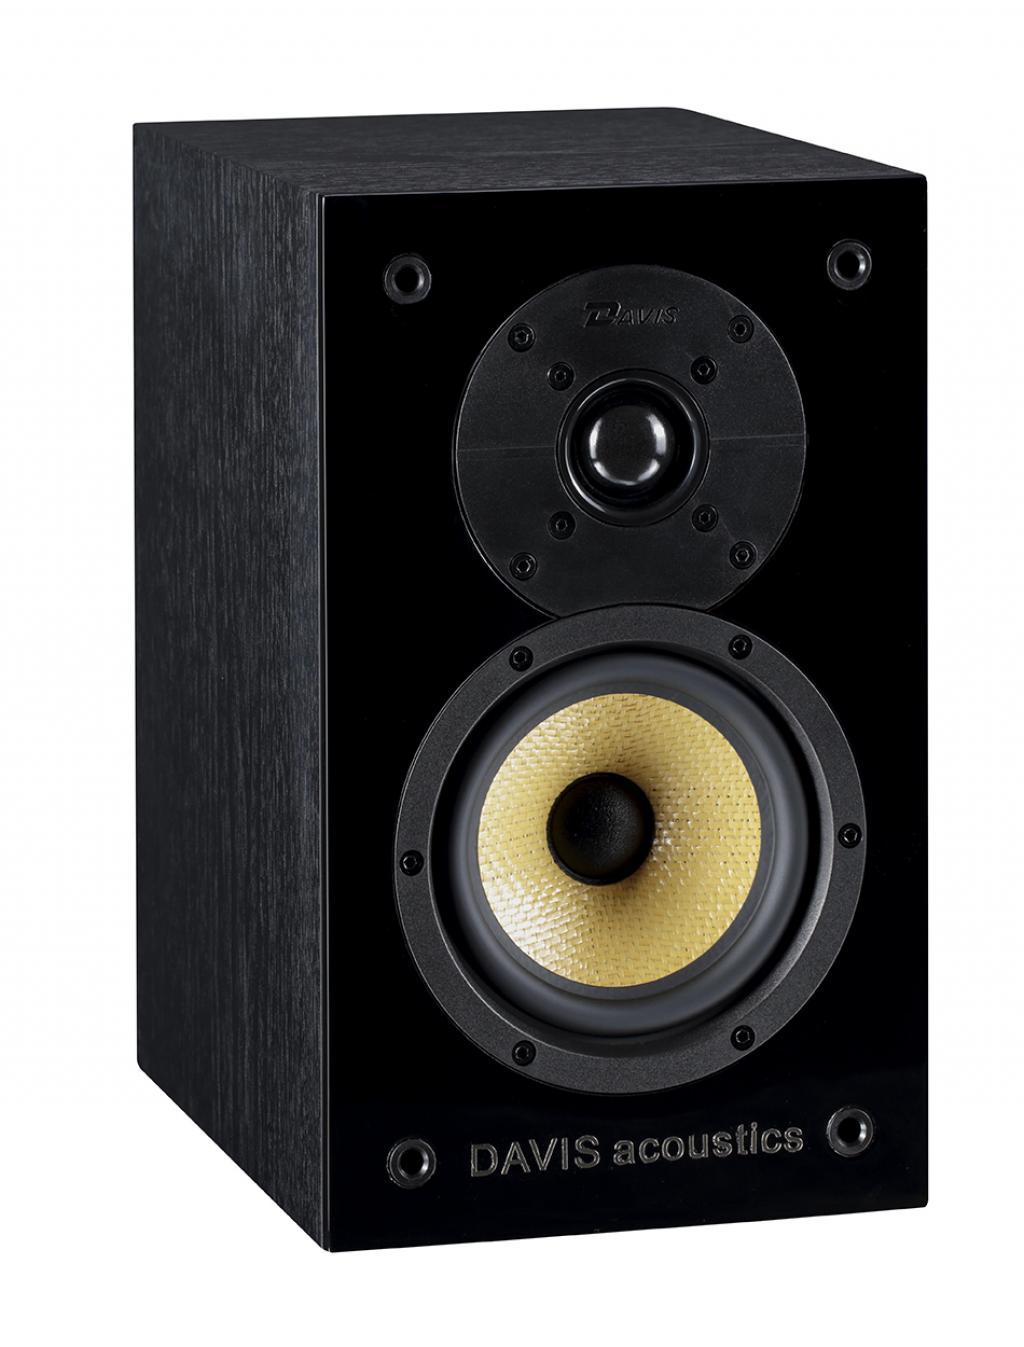 Boxe Davis Acoustics Balthus 30 Walnut